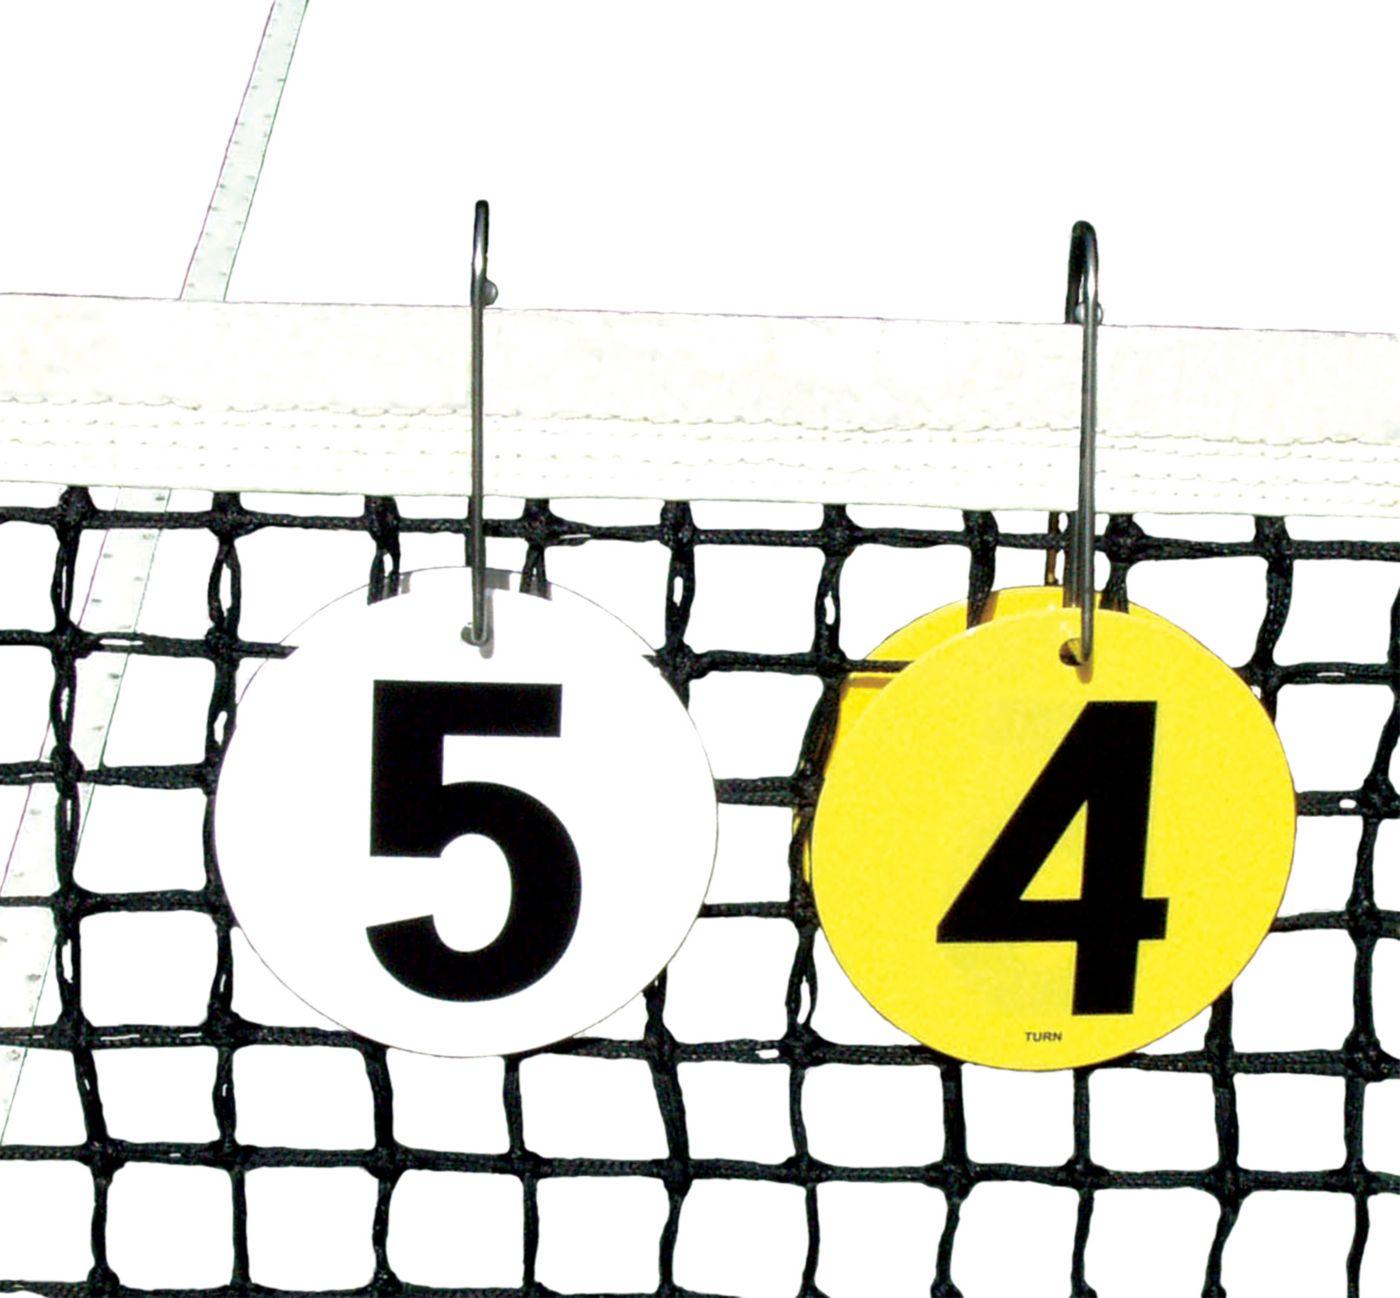 Tourna Portable Tennis Net Scorekeeper